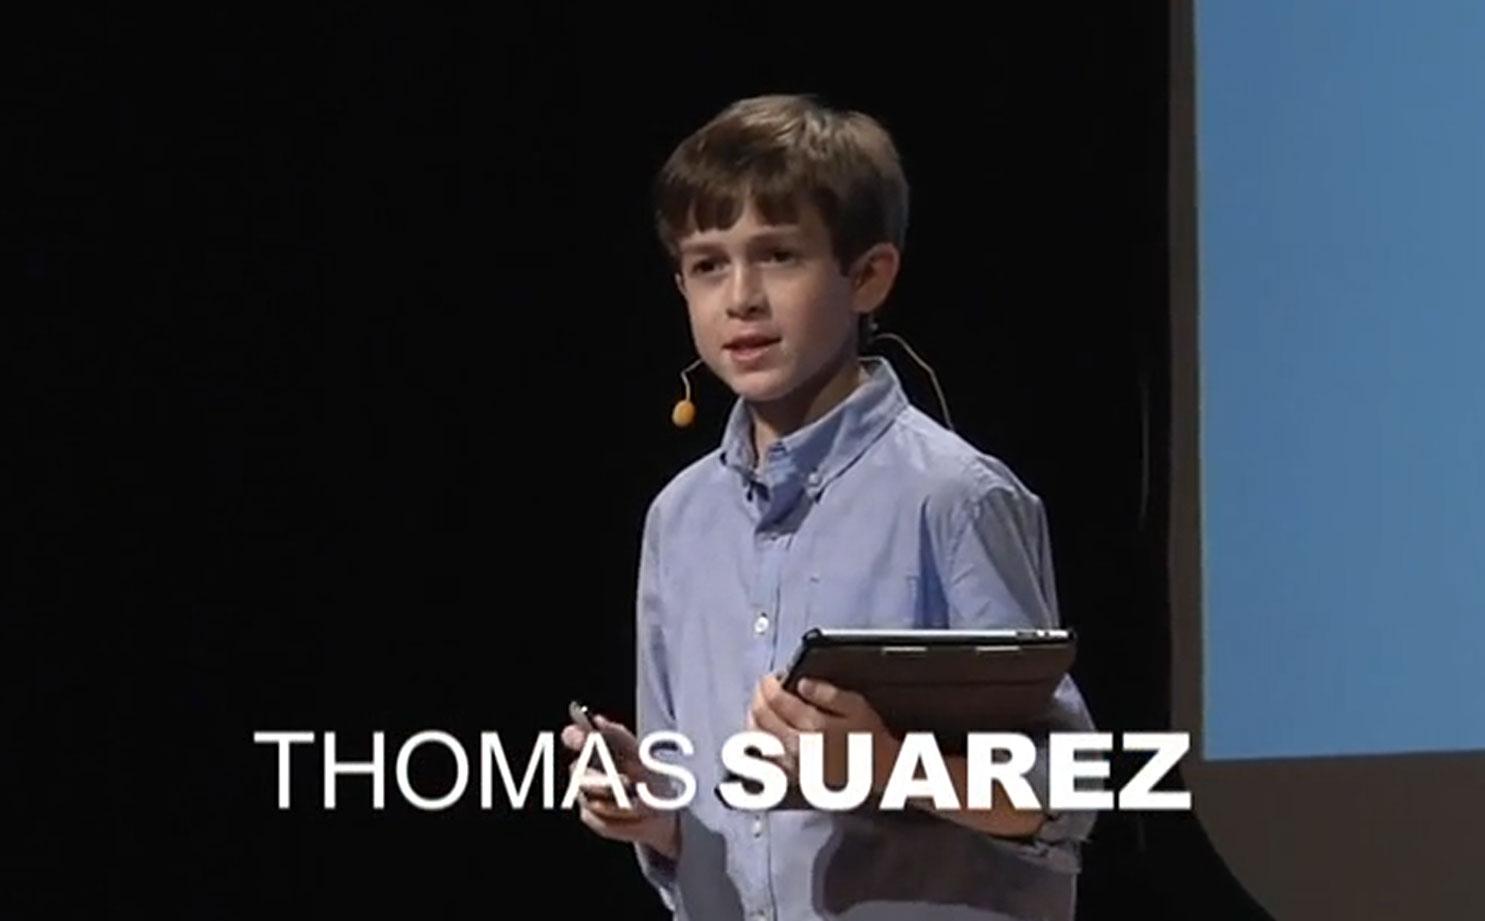 Speakers Thomas Suarez: Developer, 12 year old